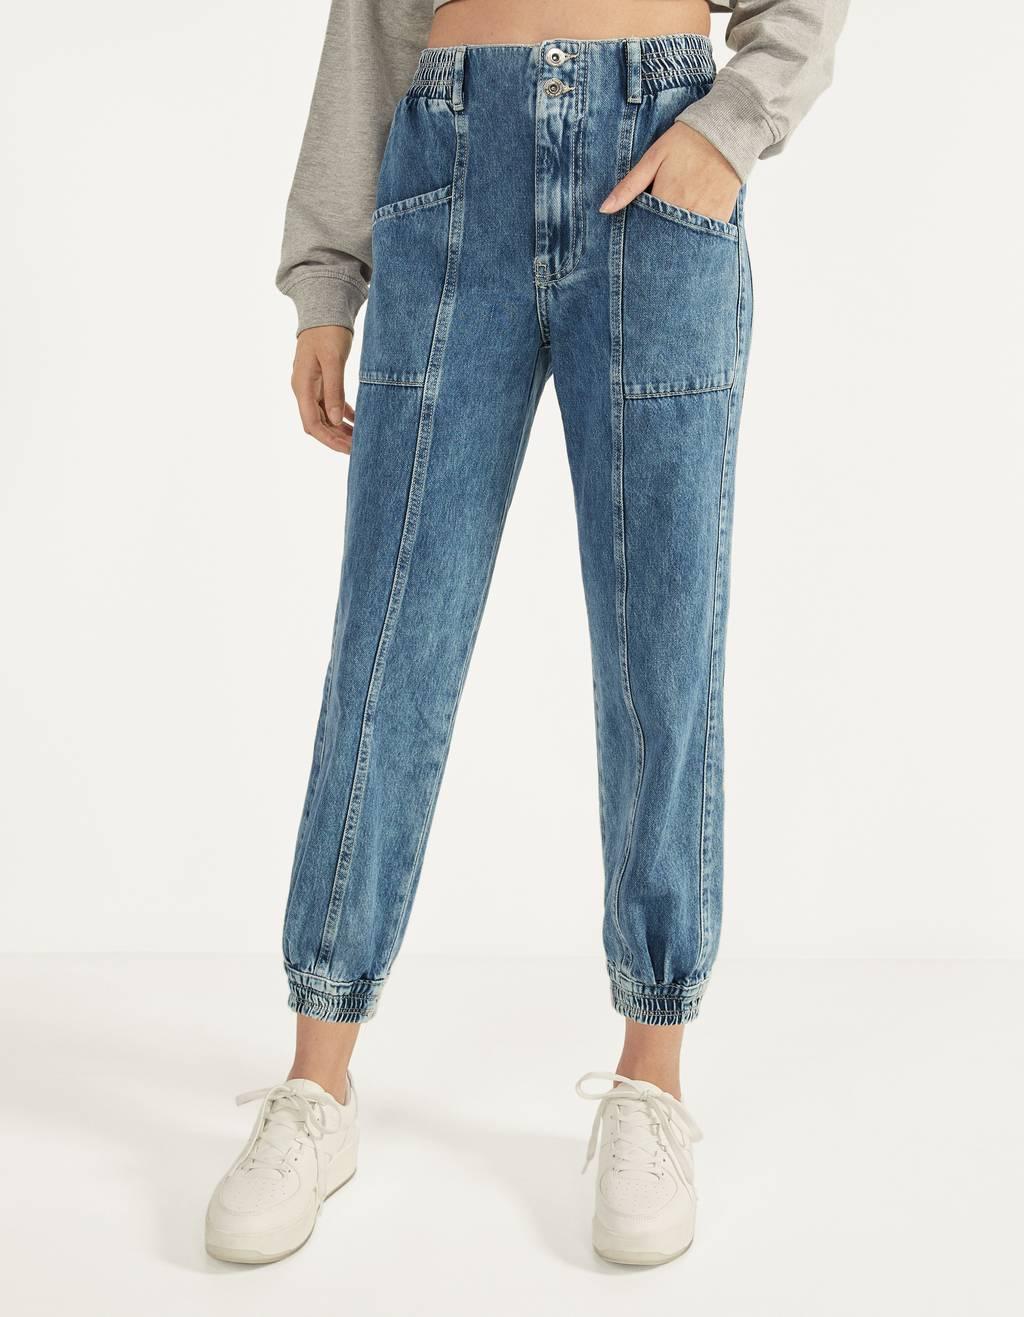 Jeans im Joggerstil